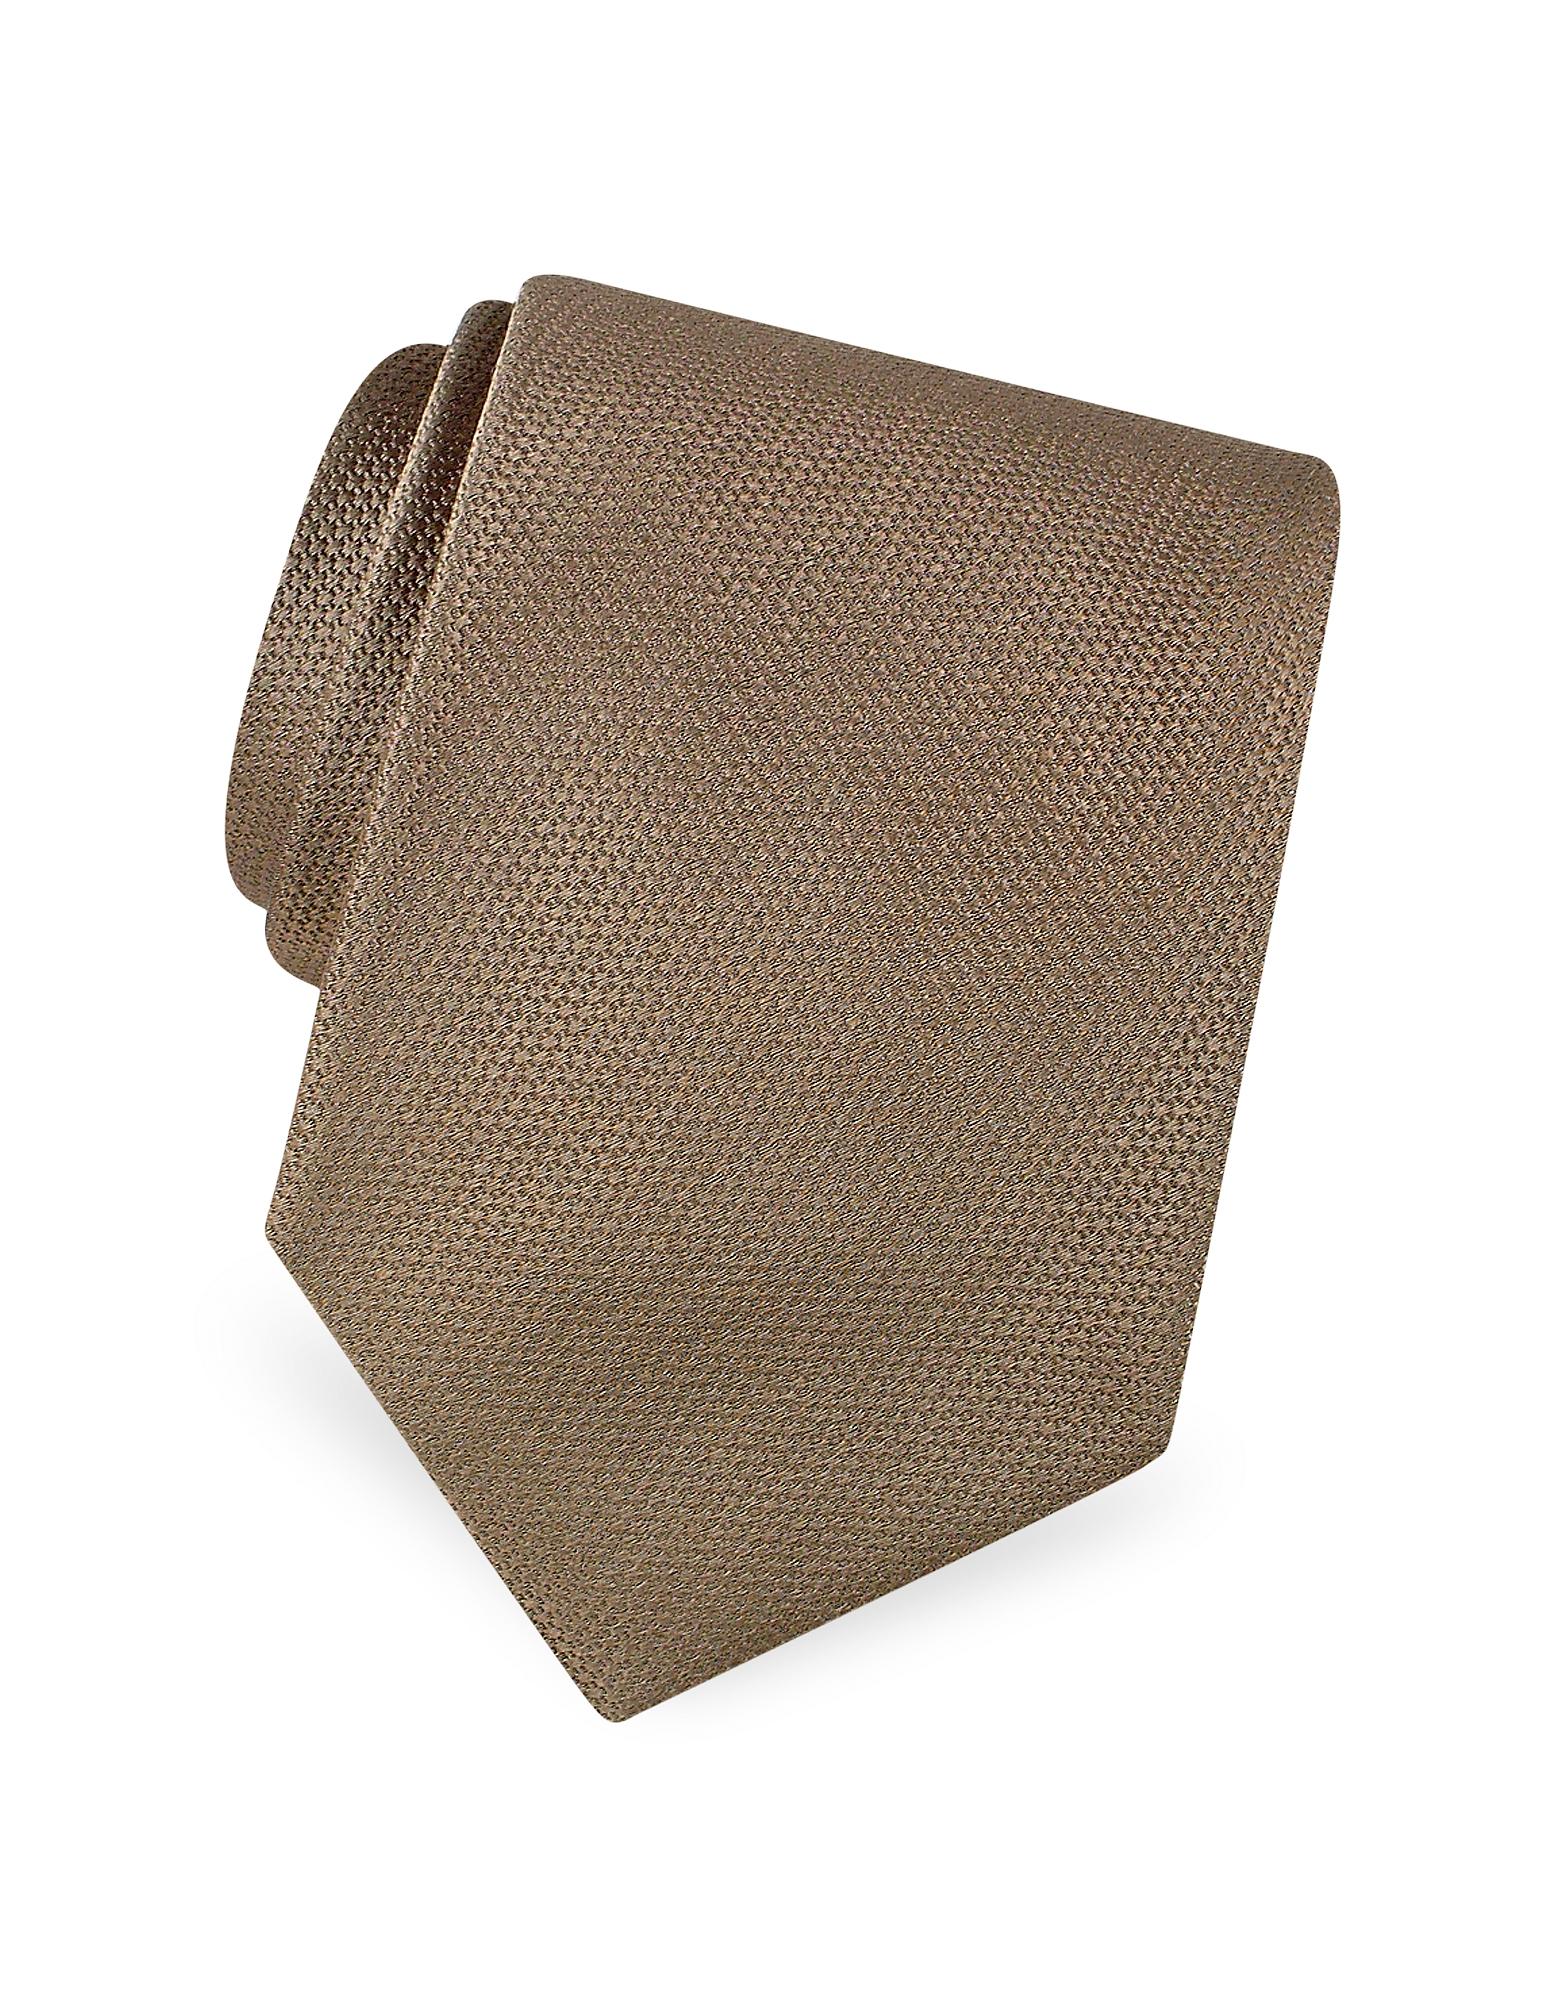 Forzieri Ties, Gold Line Solid Woven Silk Tie